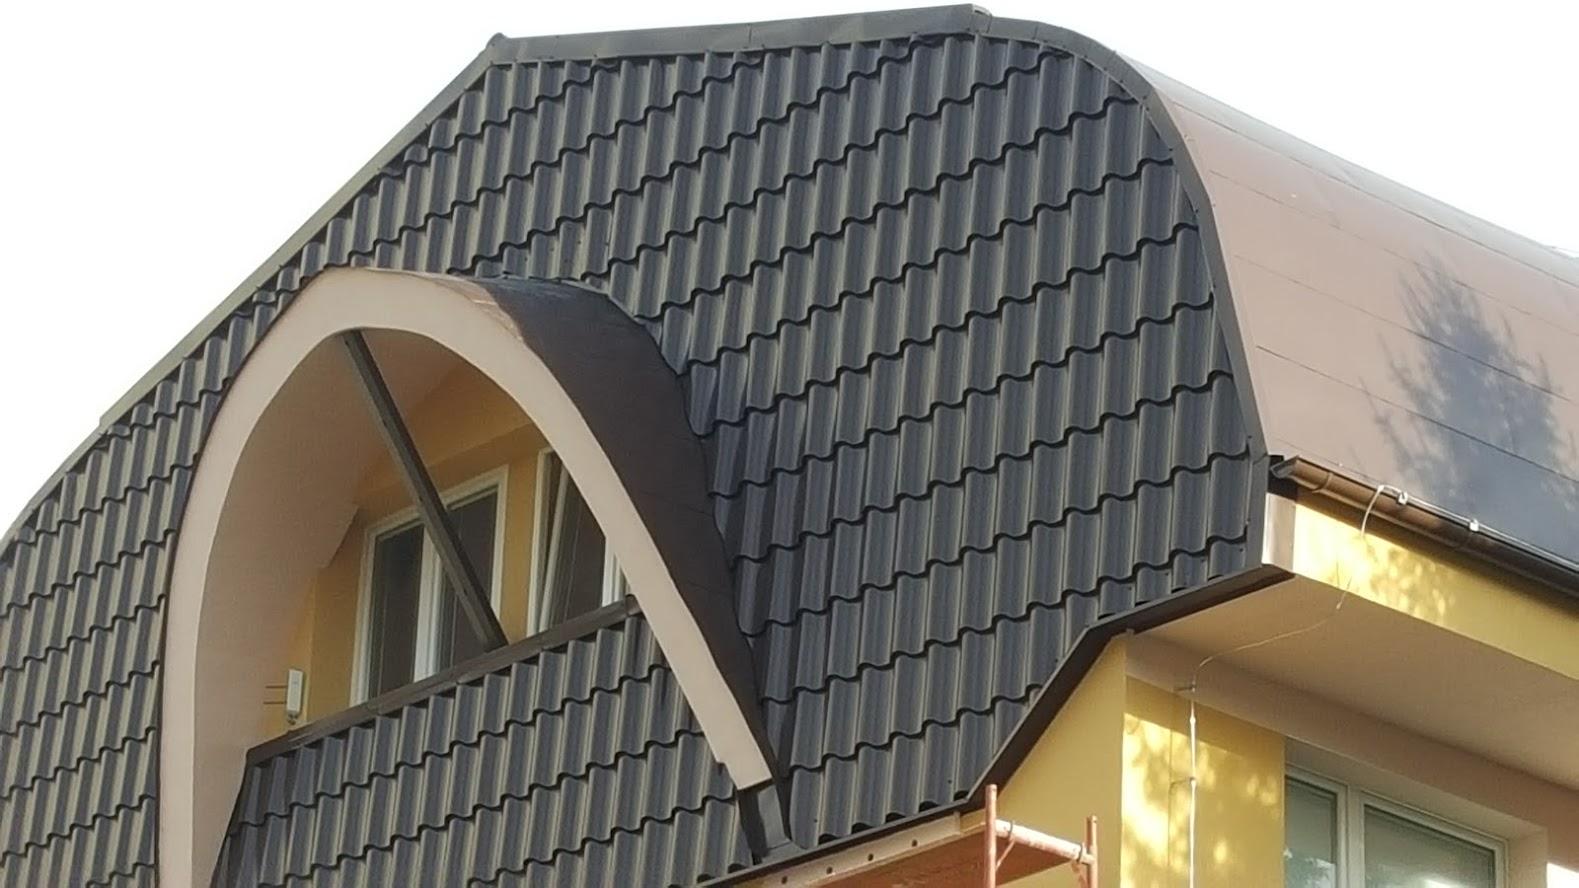 Soter-Dach (28)